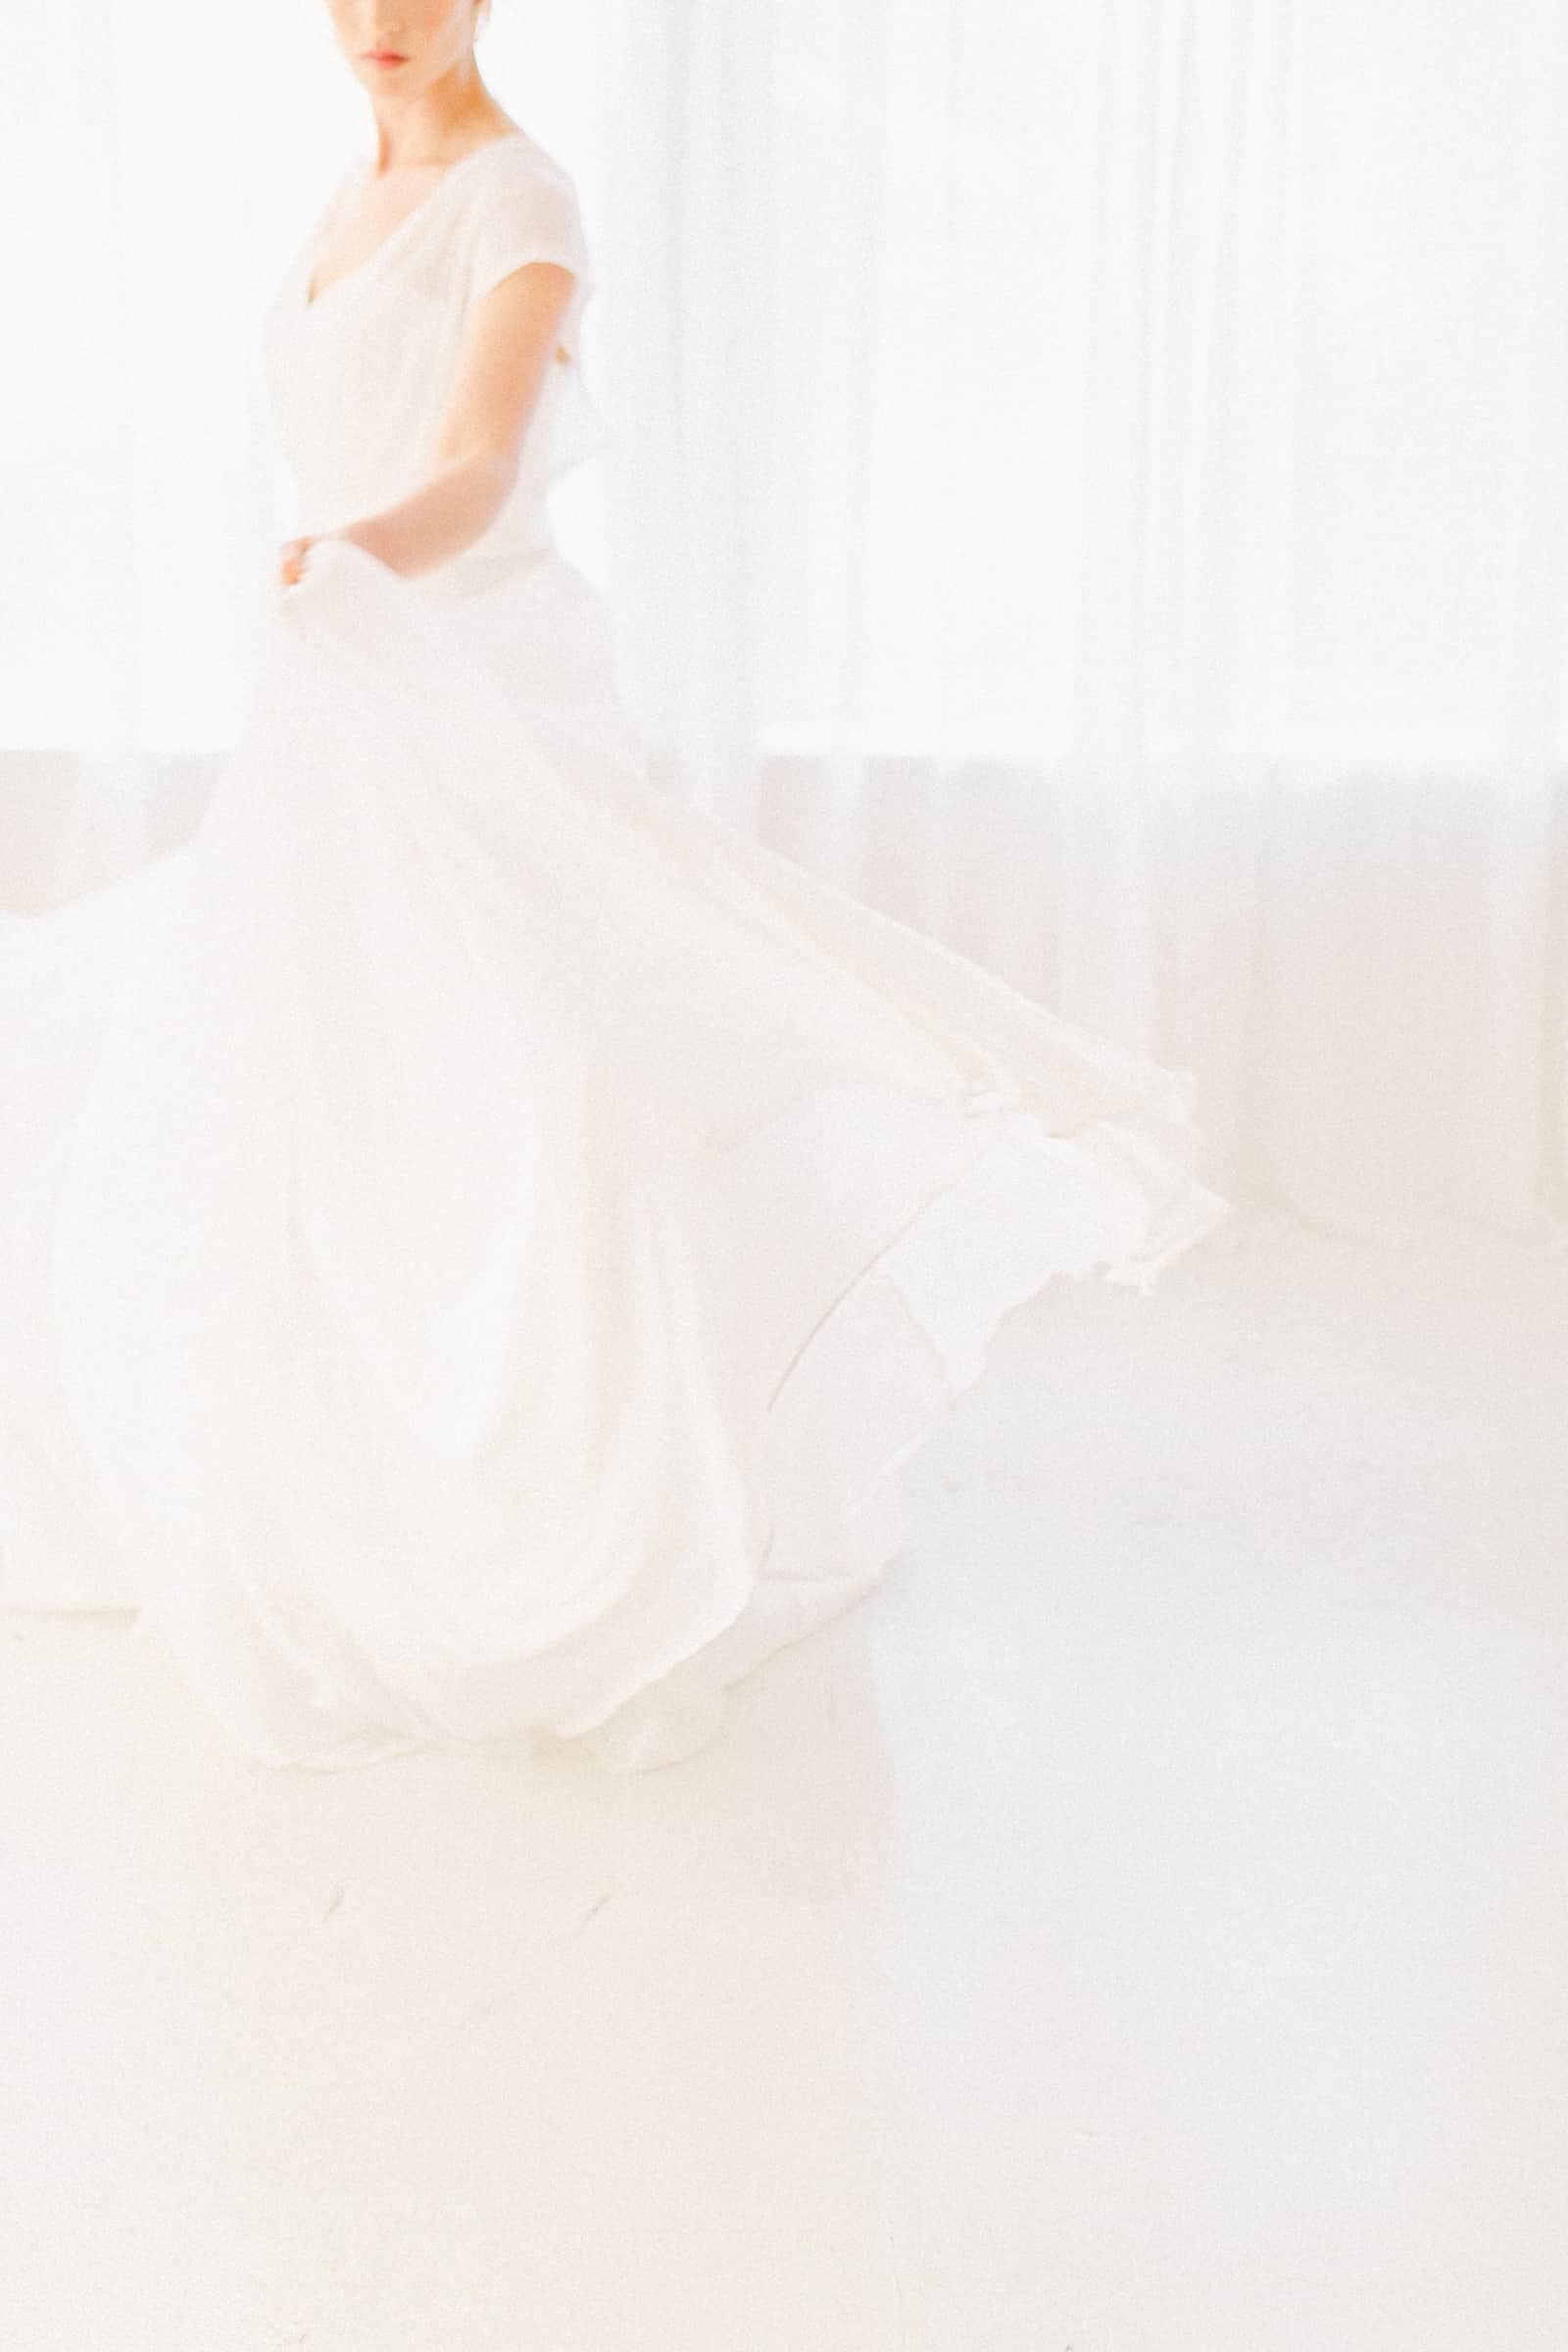 Bride twirls in flowy white wedding dress